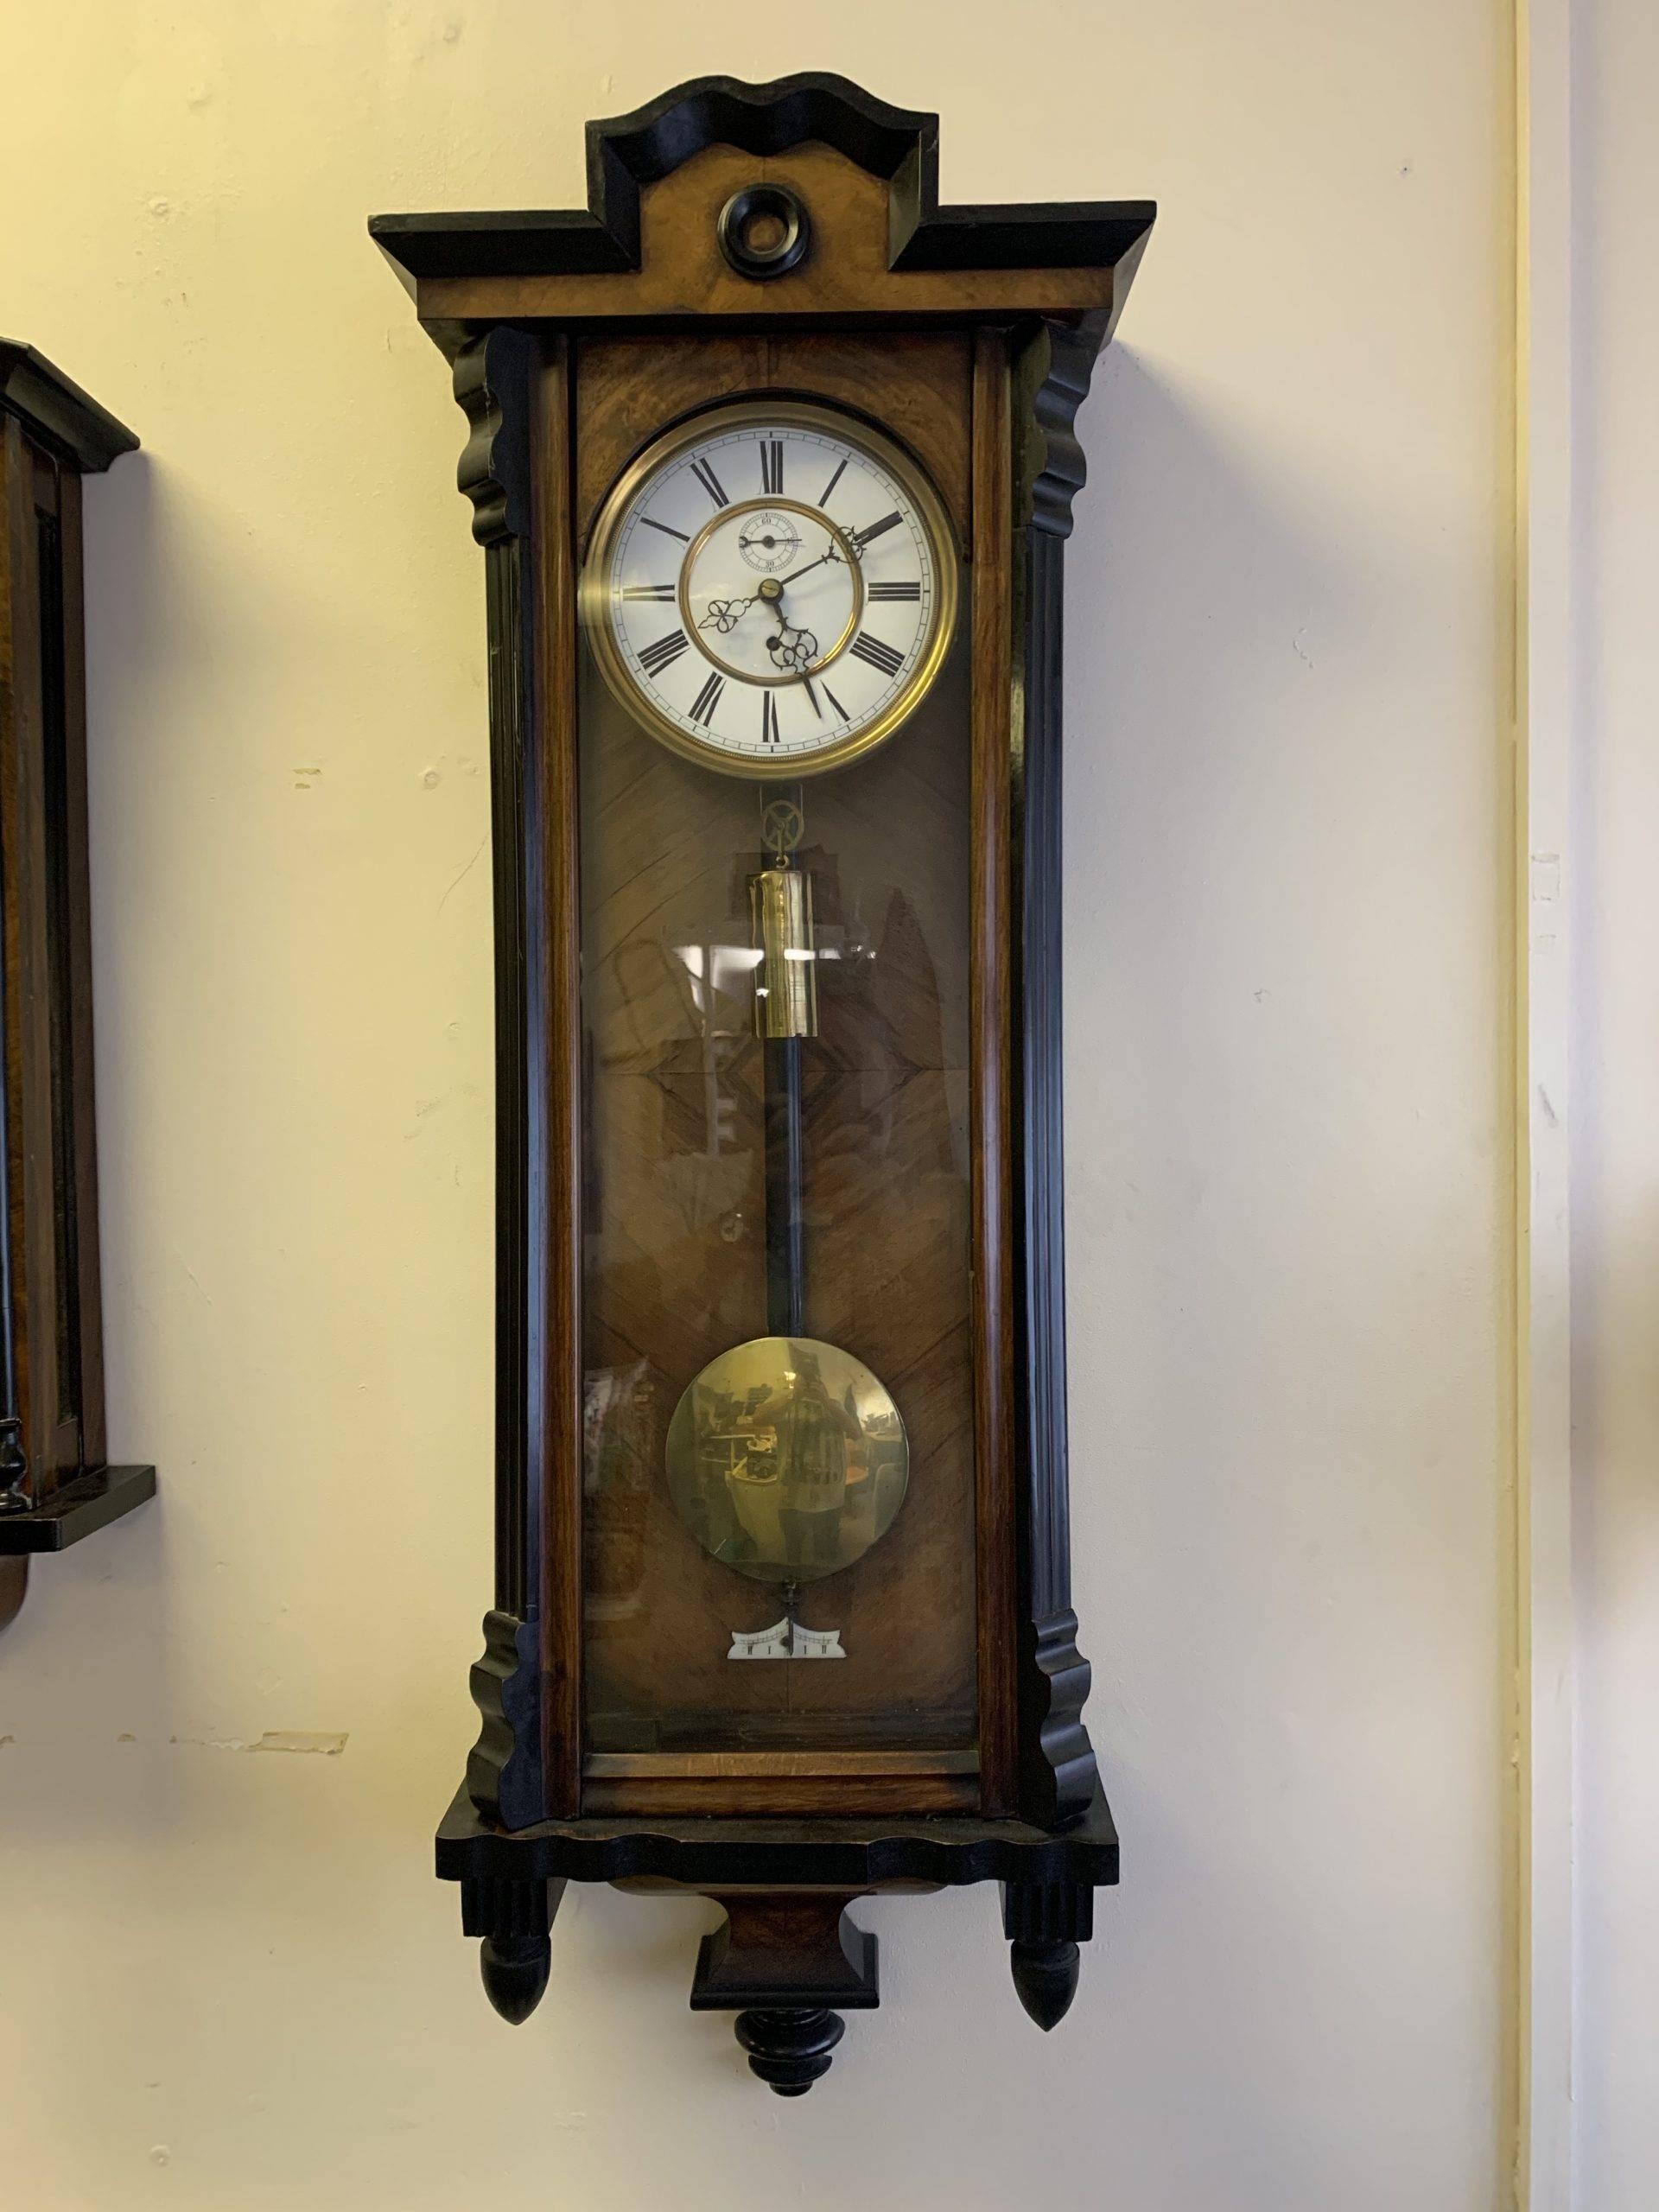 wall hanging clock with long golden pendulum